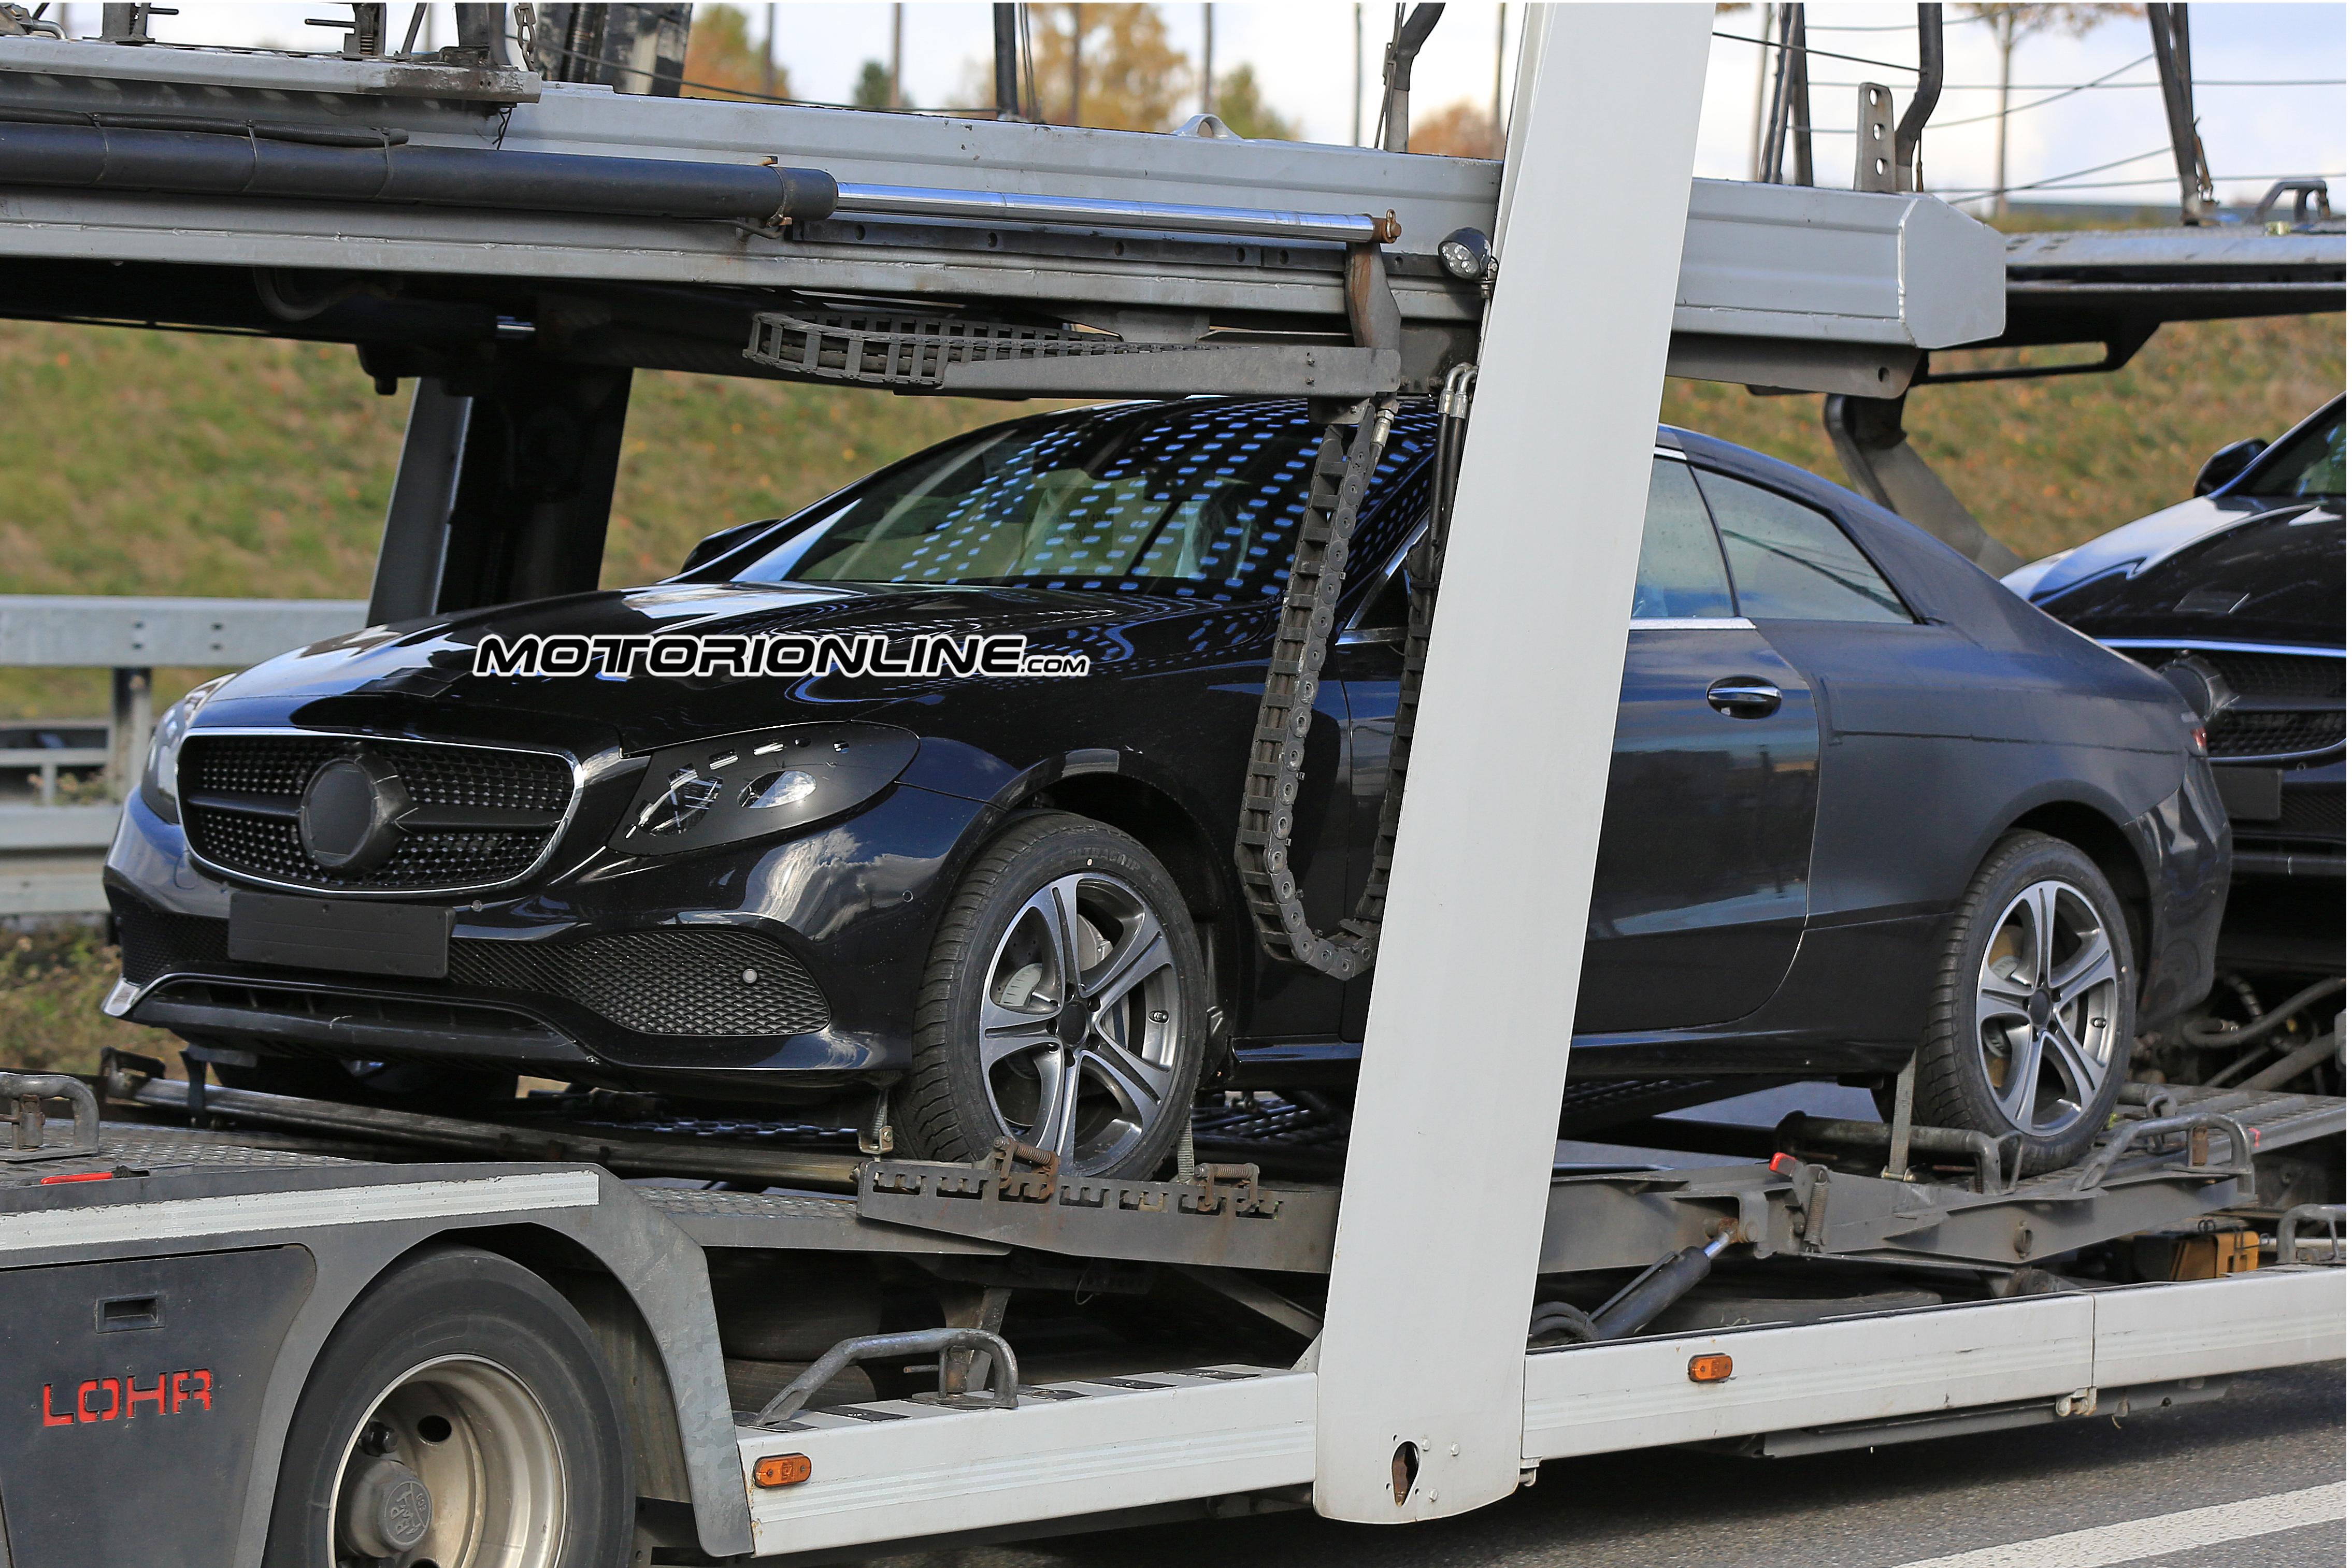 Mercedes Classe E Coupè MY 2018 foto spia 4 novembre 2016